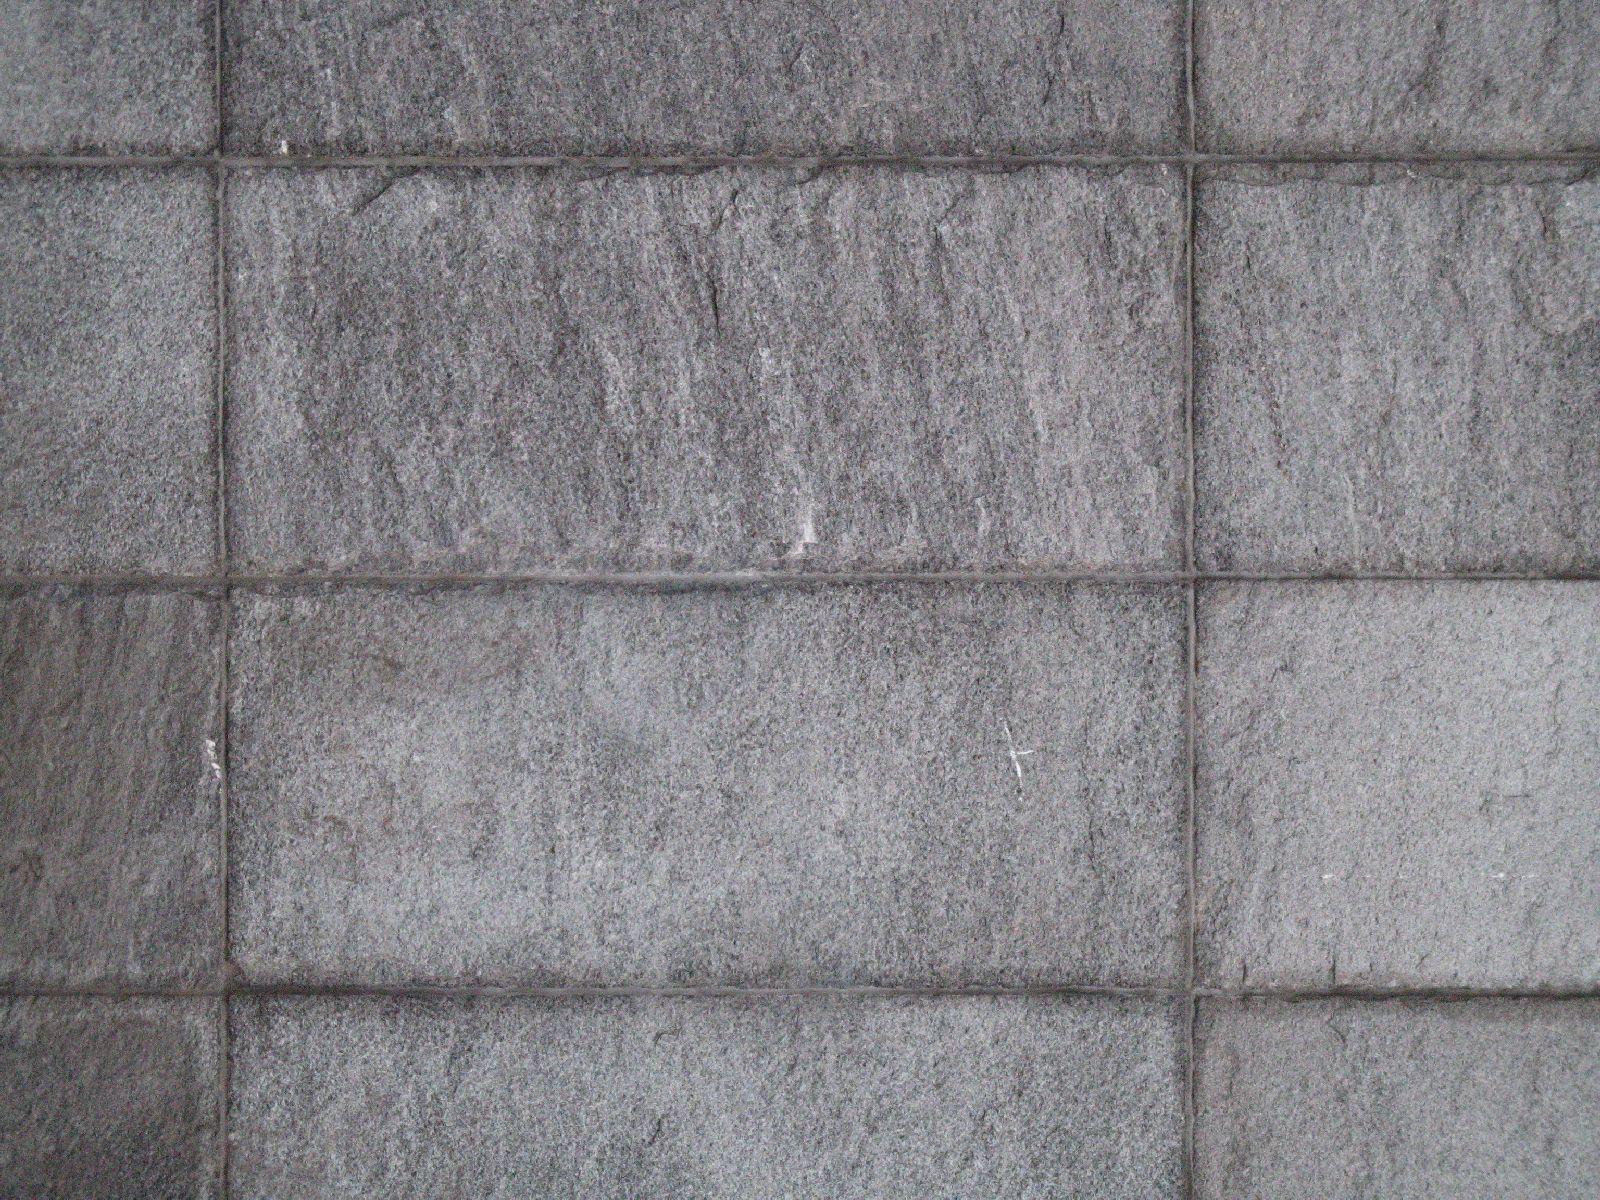 Stone_Texture_B_04046